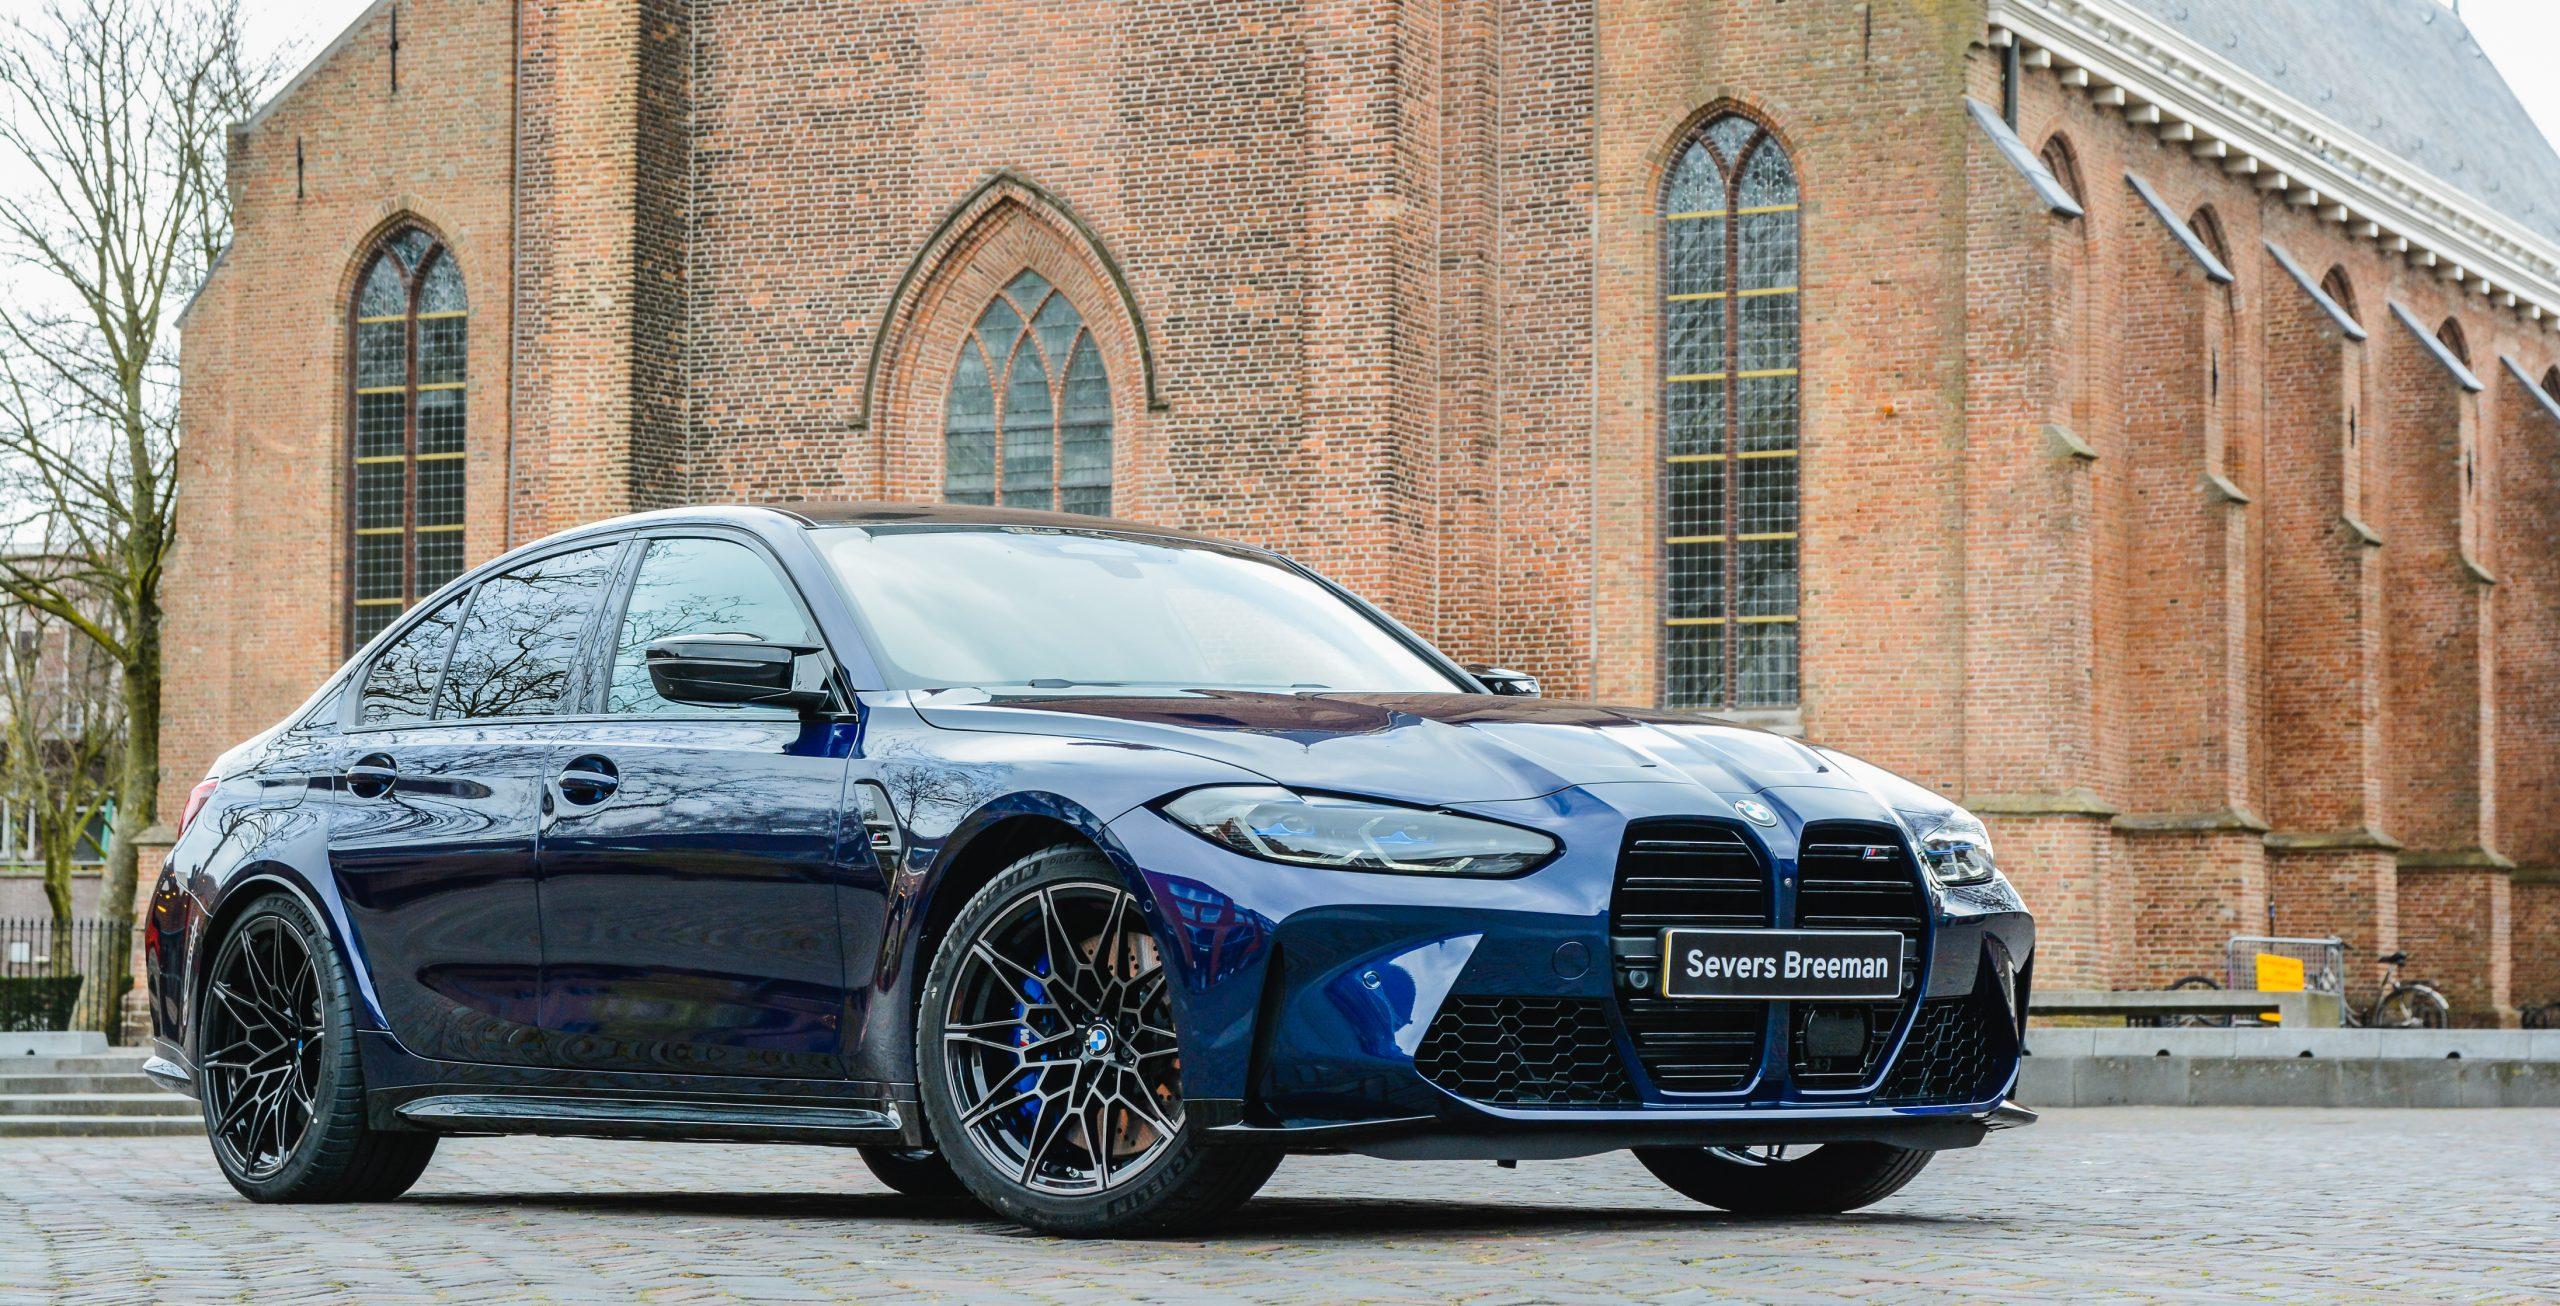 De nieuwe BMW M3 Sedan en BMW M4 Coupé